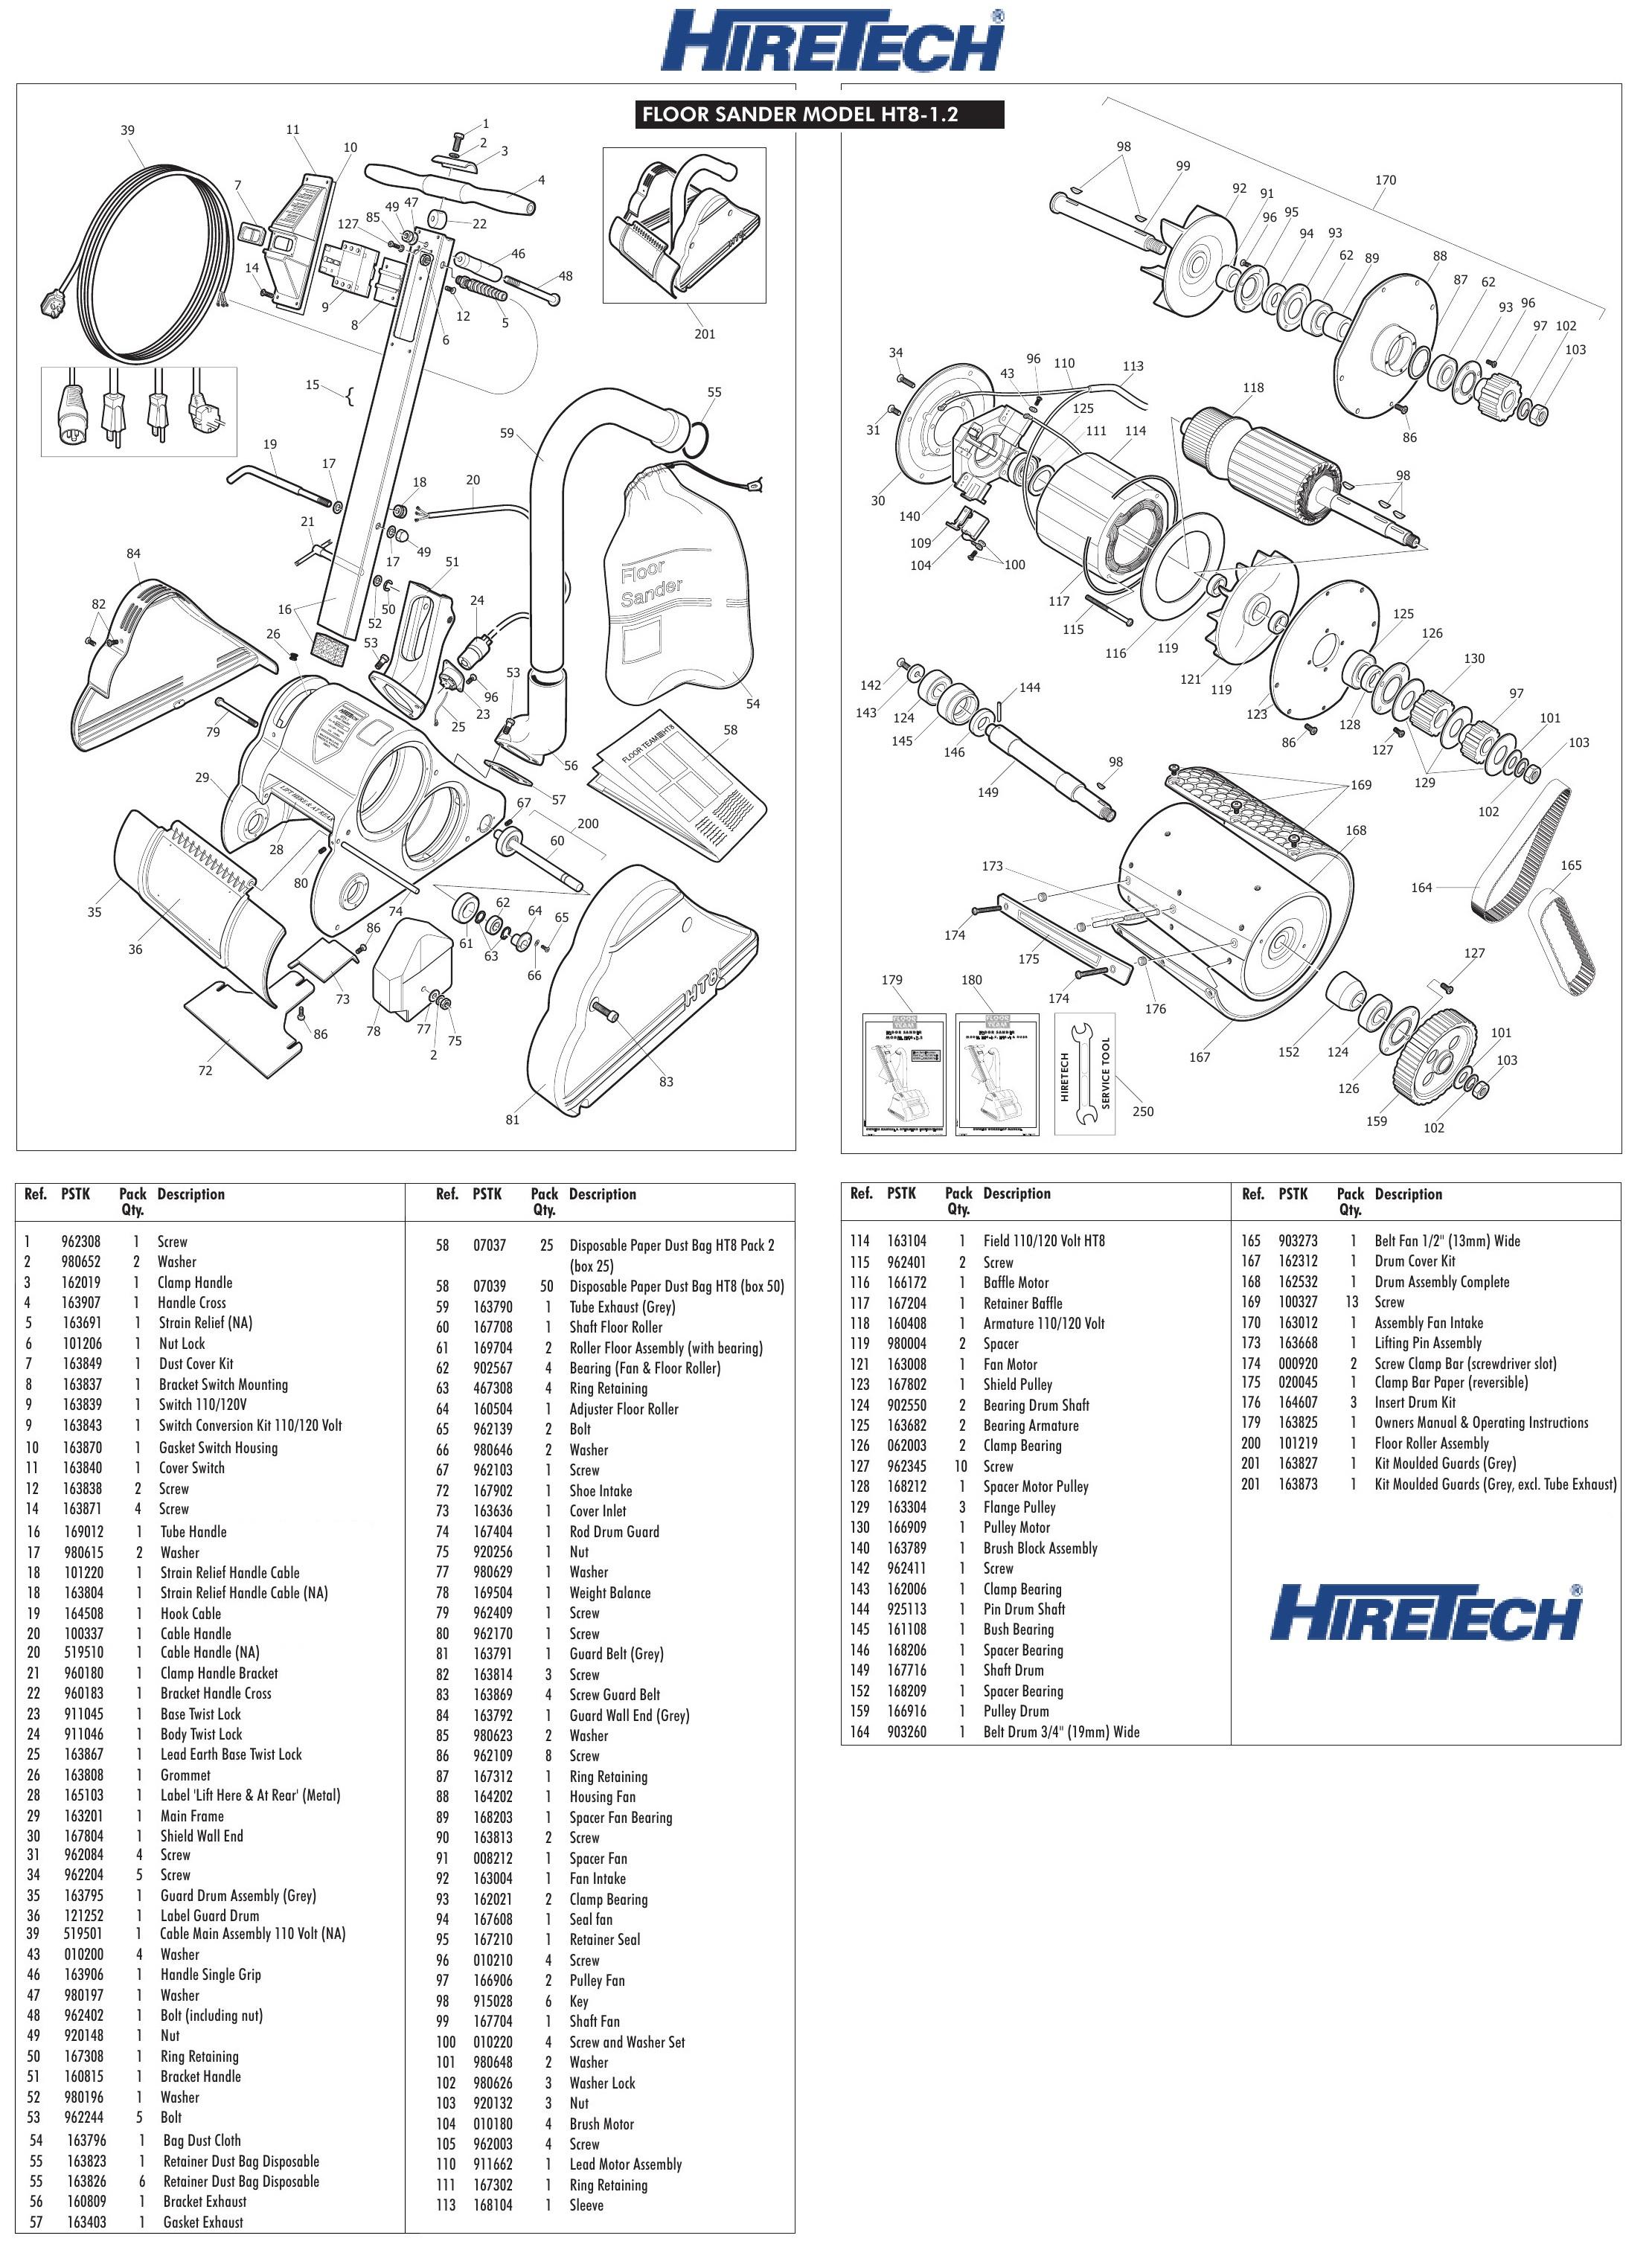 Hiretech Ht8 1 Floor Sander Parts